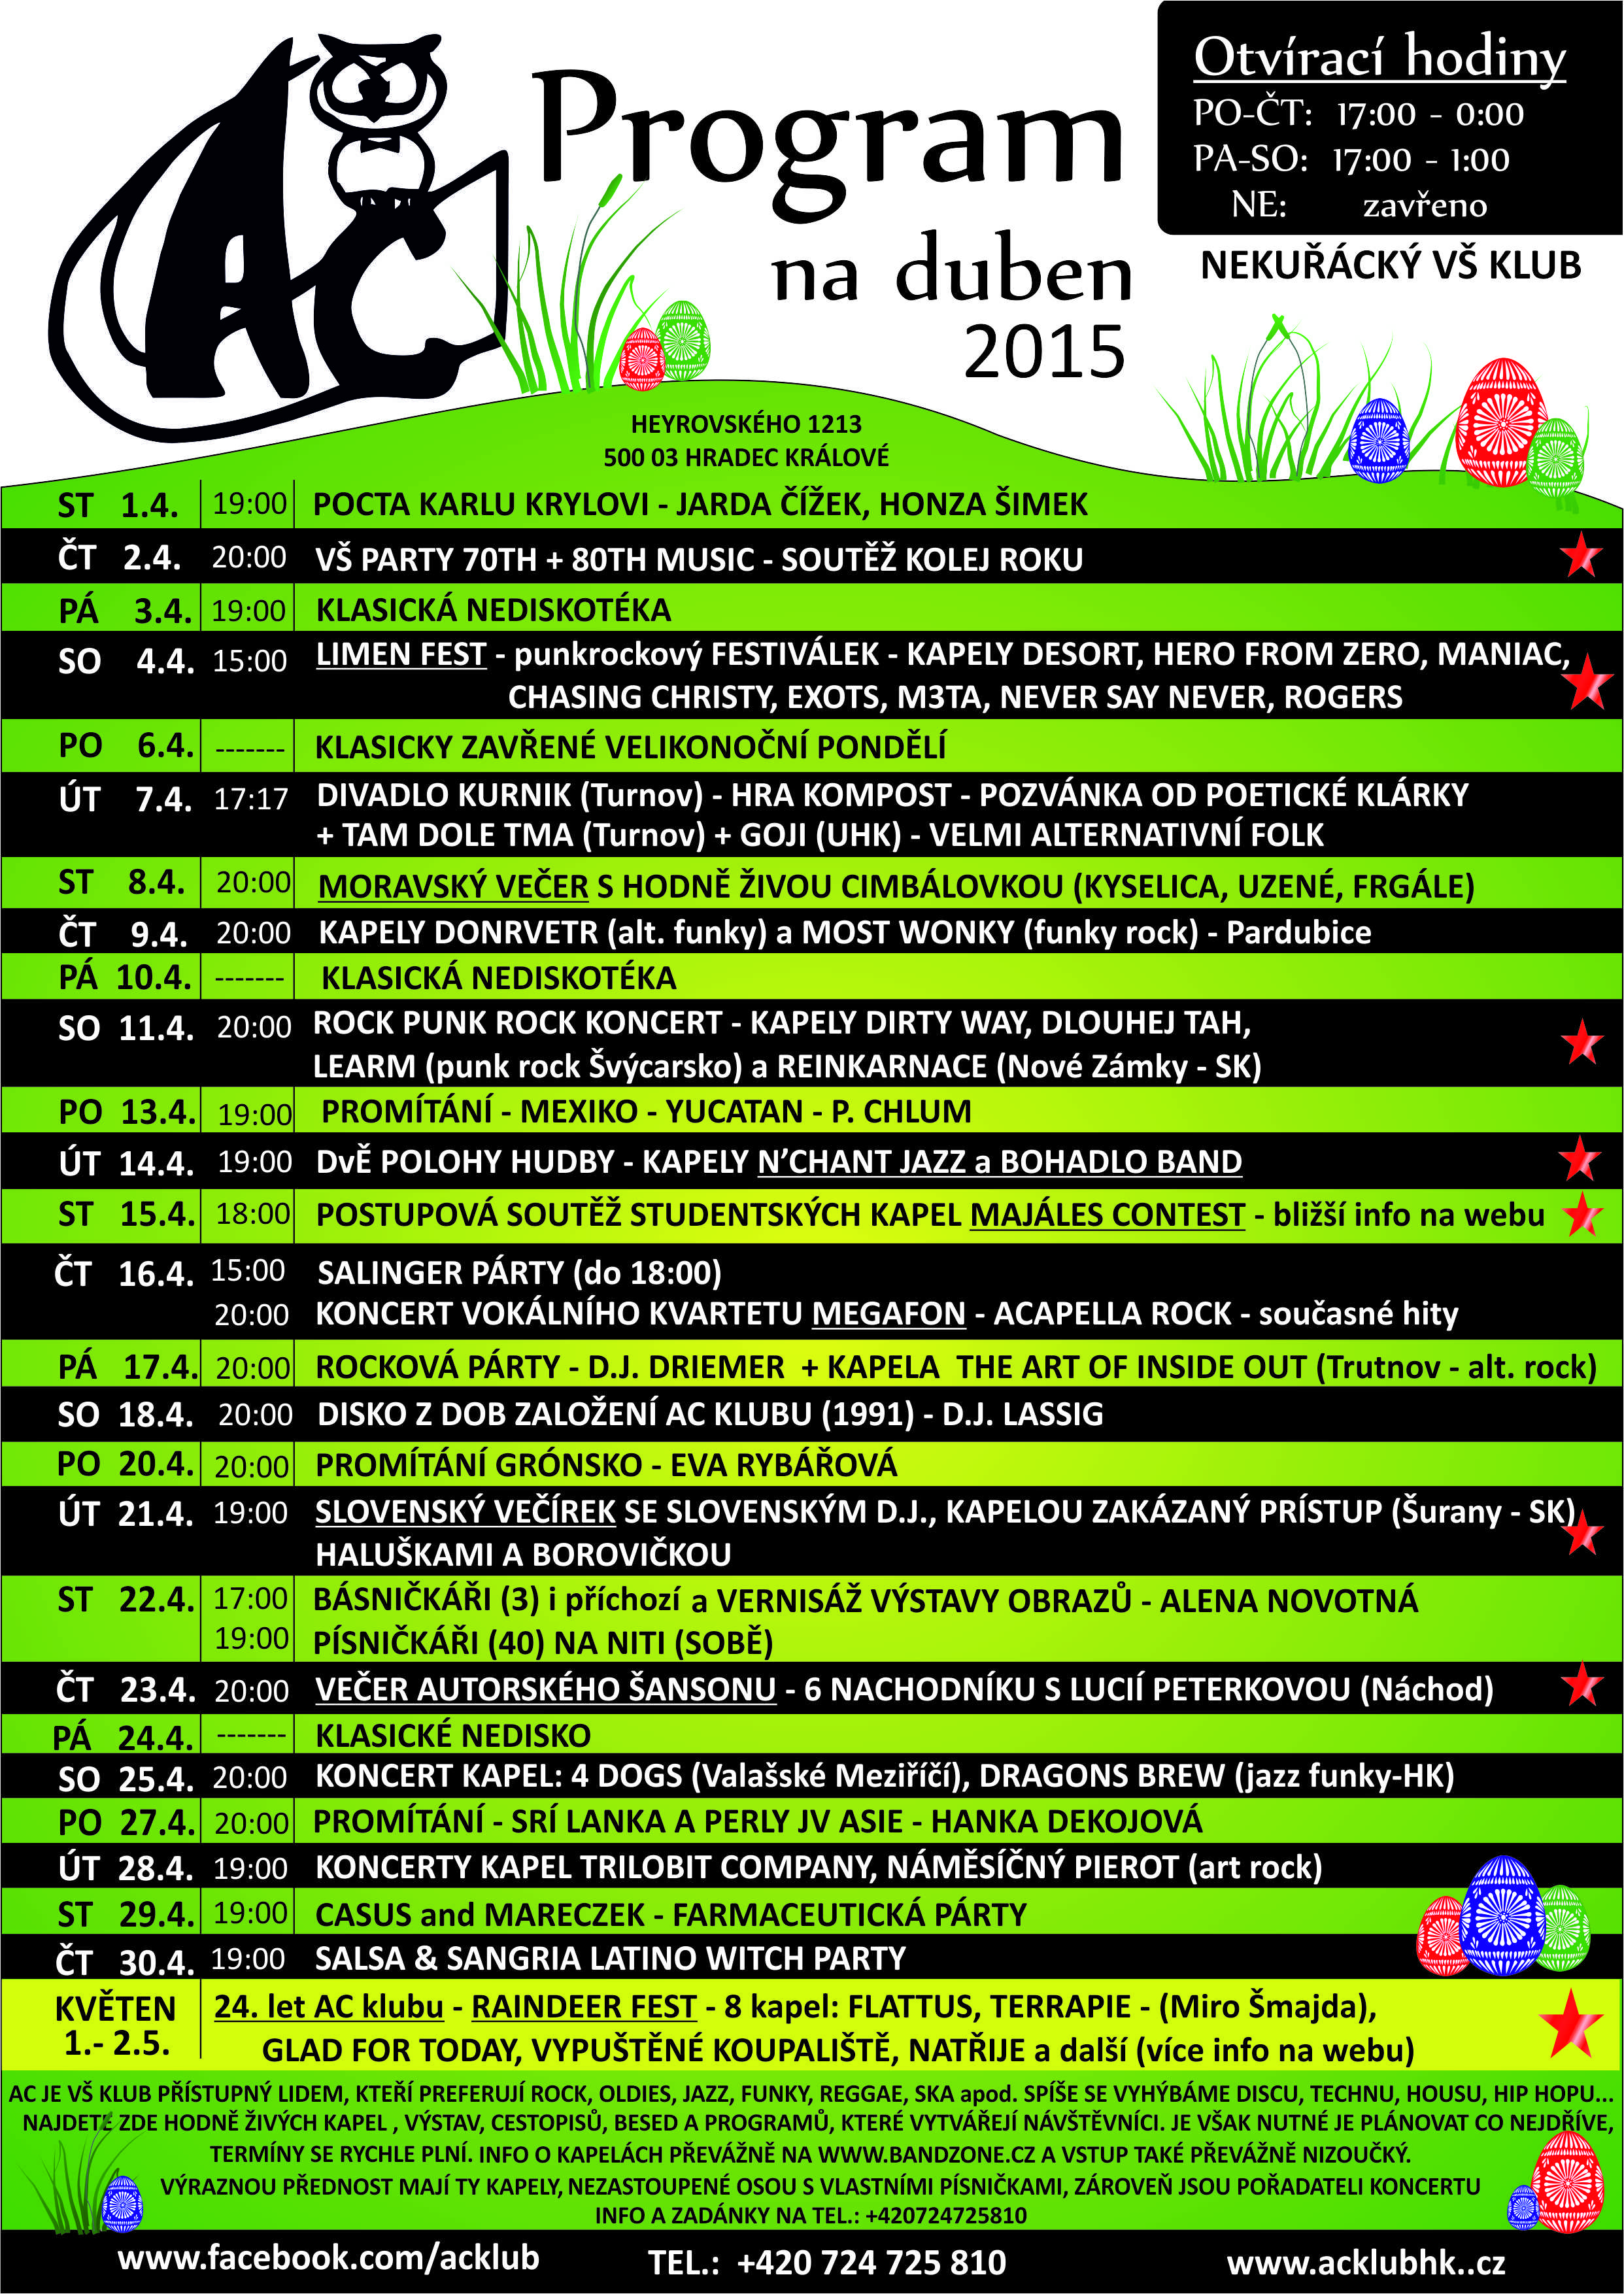 Rastr v AC_Program_duben-2015_NEKVALITNI